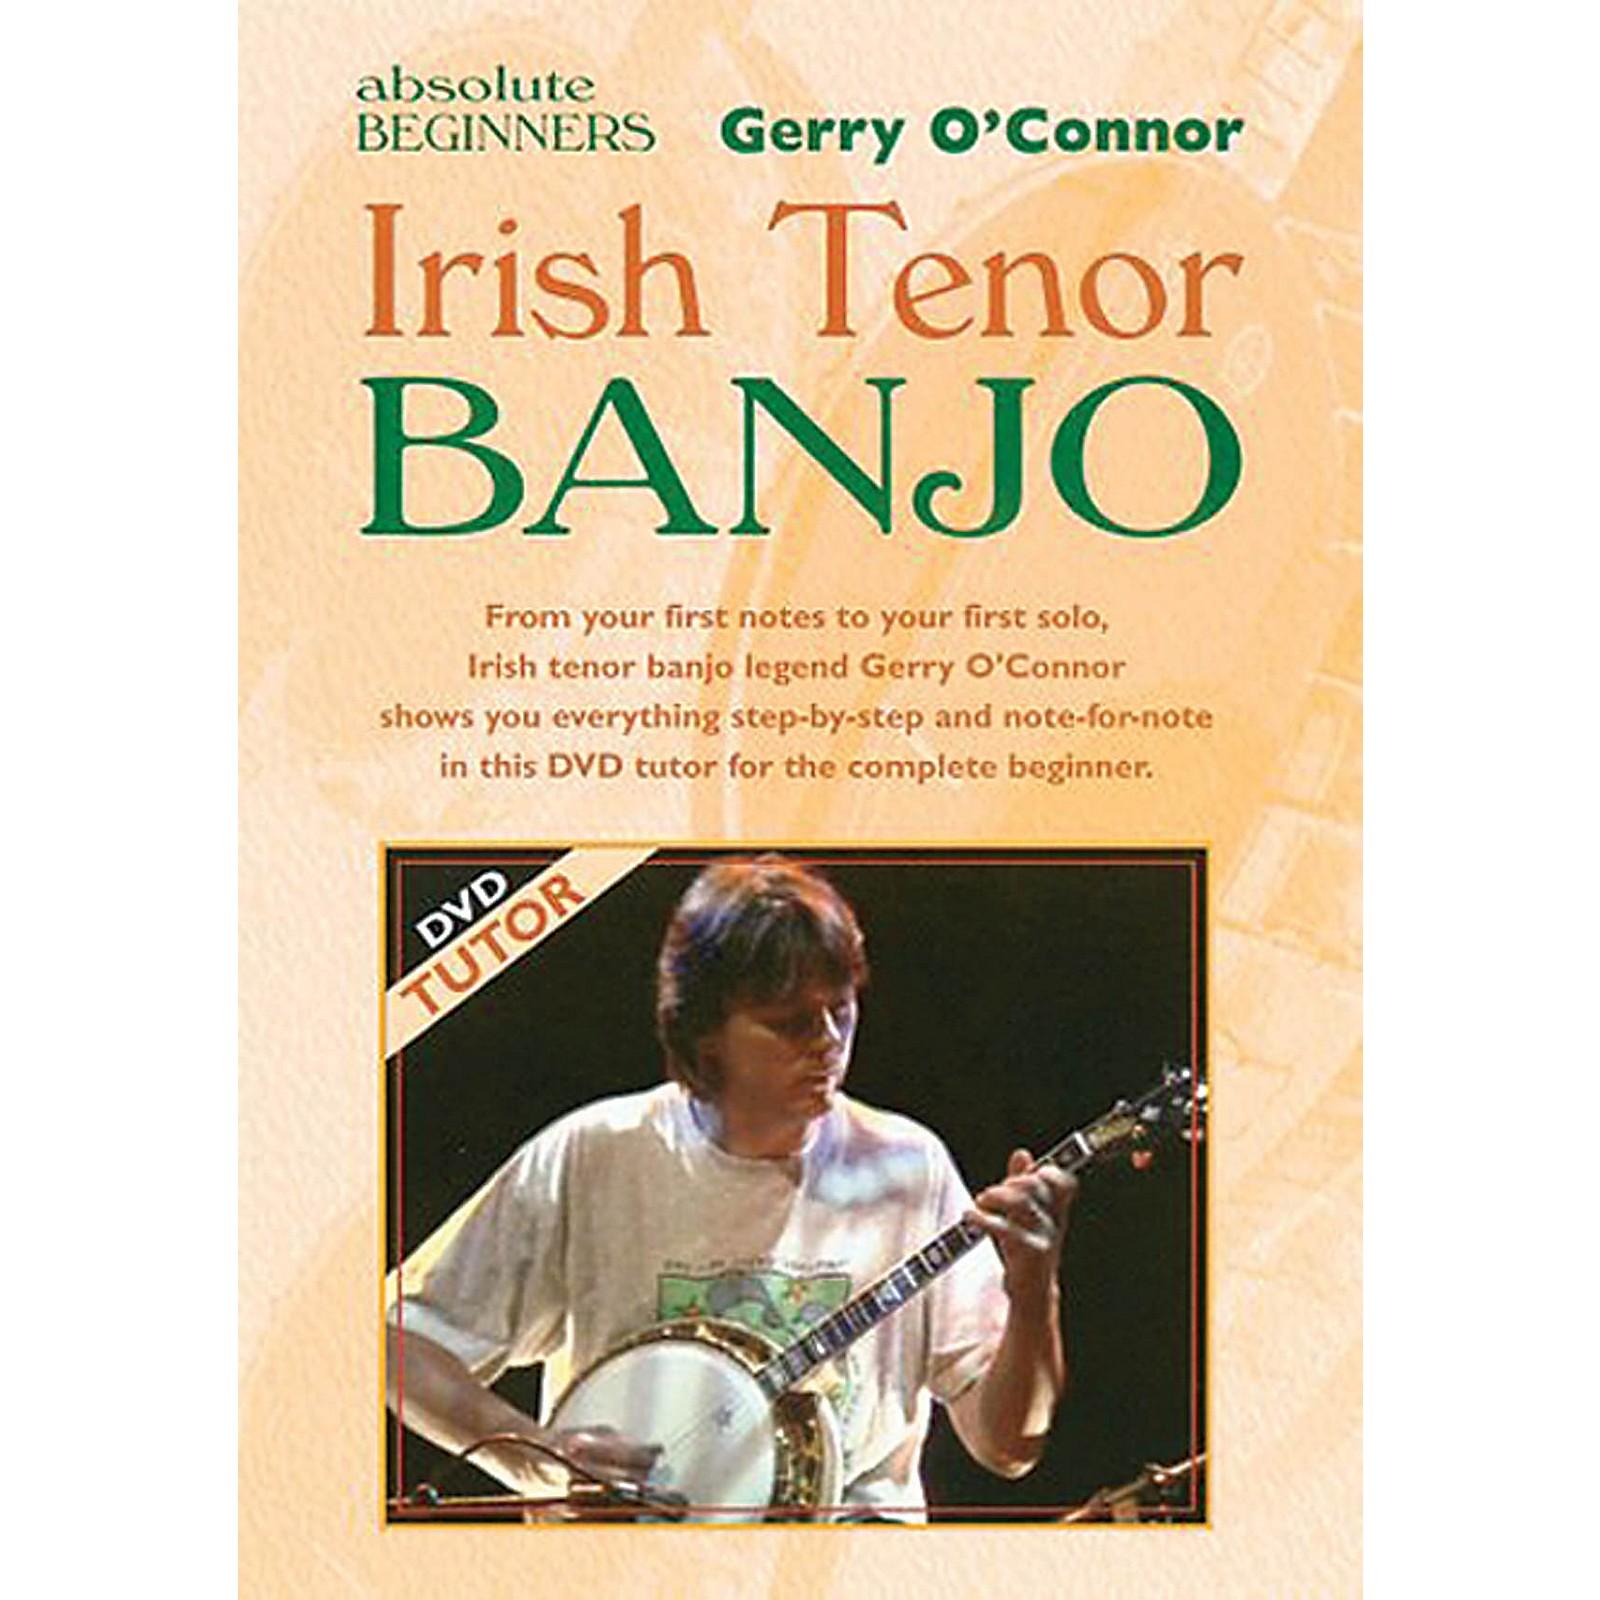 Waltons Irish Tenor Banjo (for Absolute Beginners) Waltons Irish Music Books Series DVD Written by Gerry O'Connor